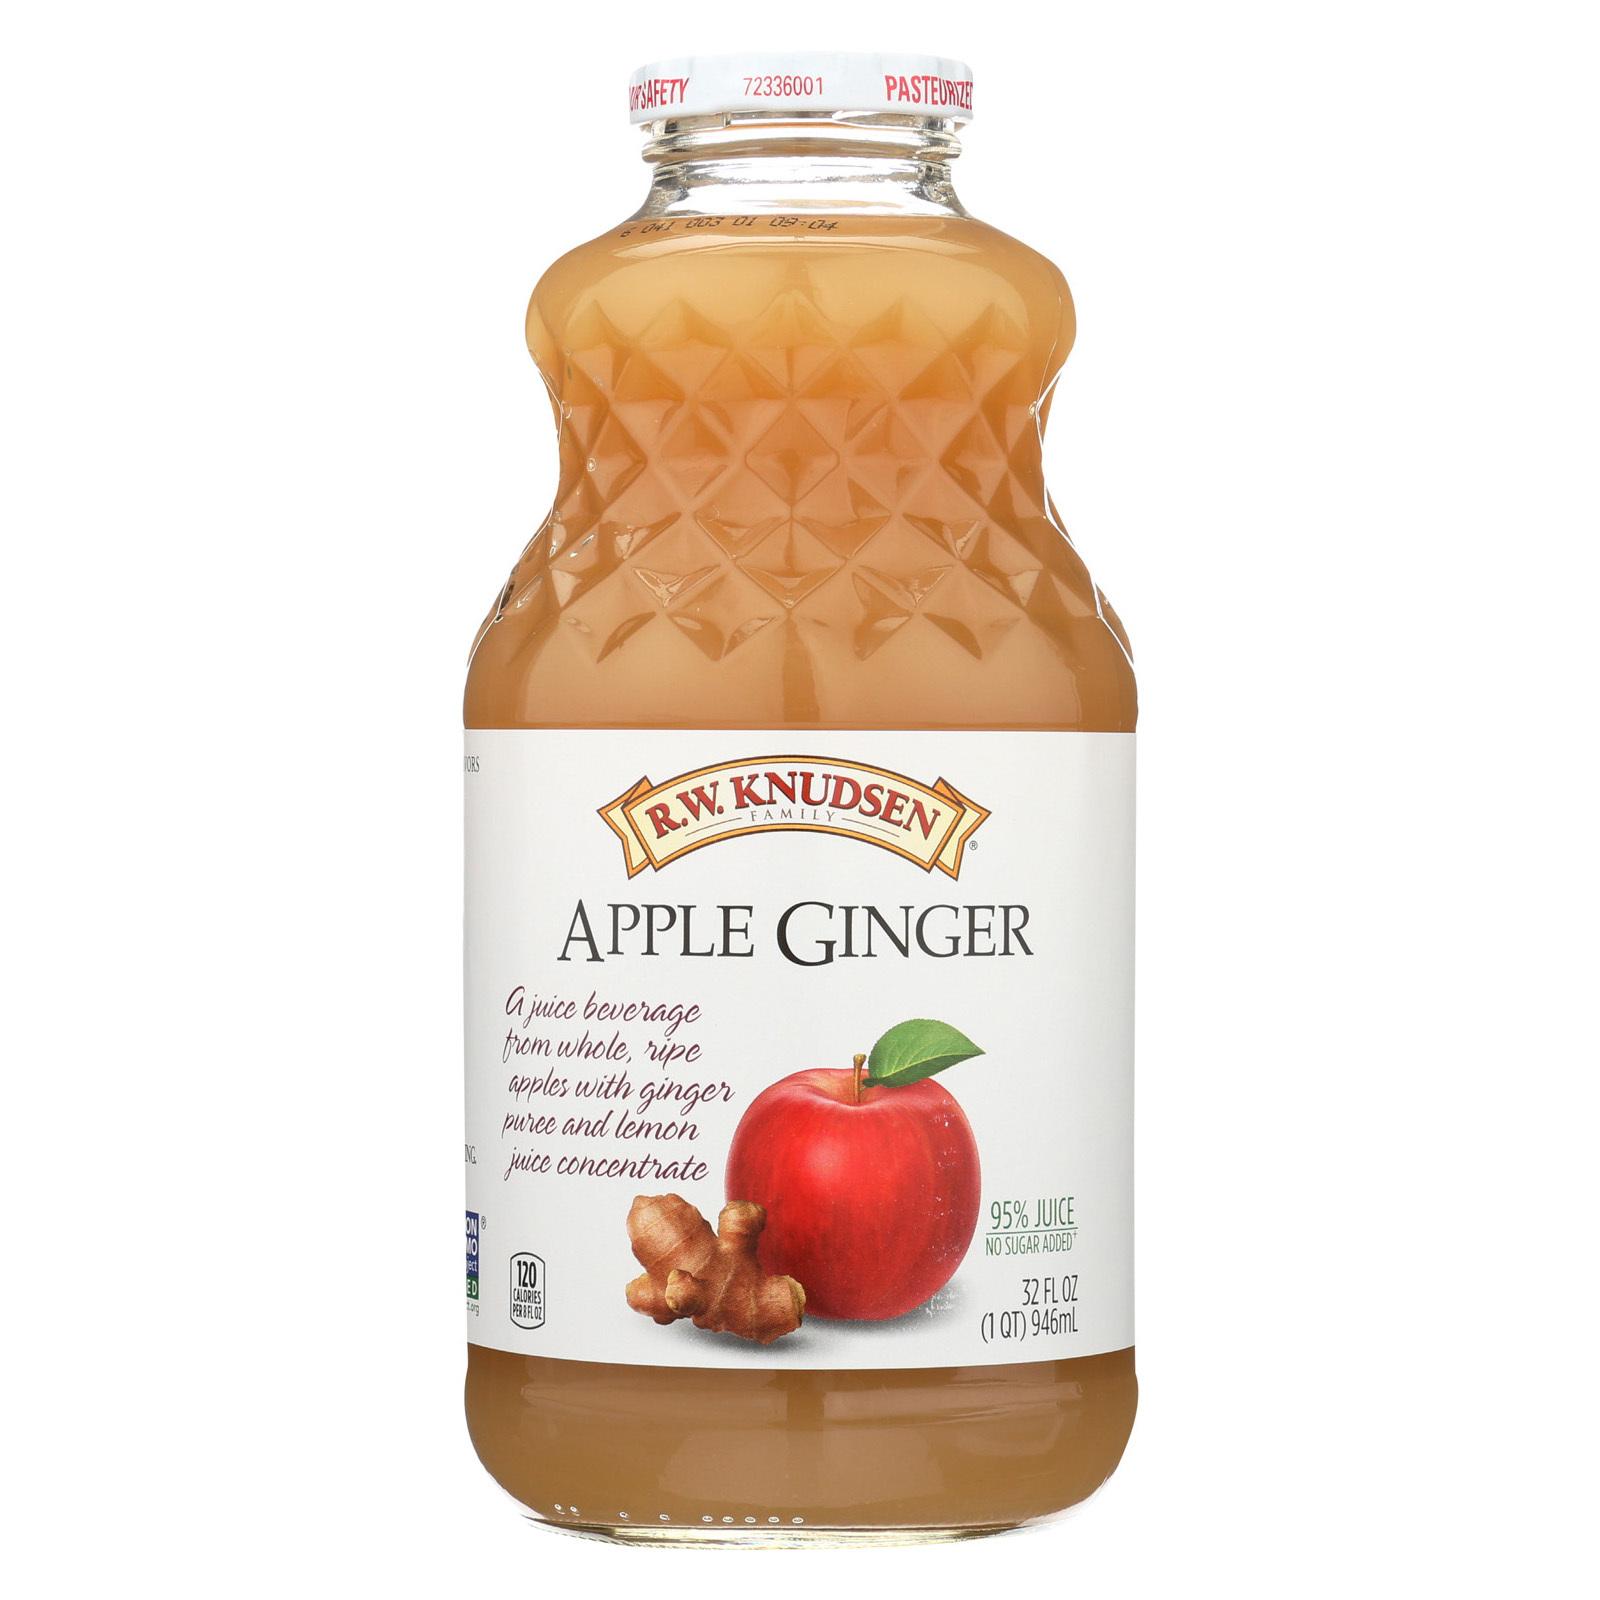 R.W. Knudsen Juice - Apple Ginger - Case of 12 - 32 oz